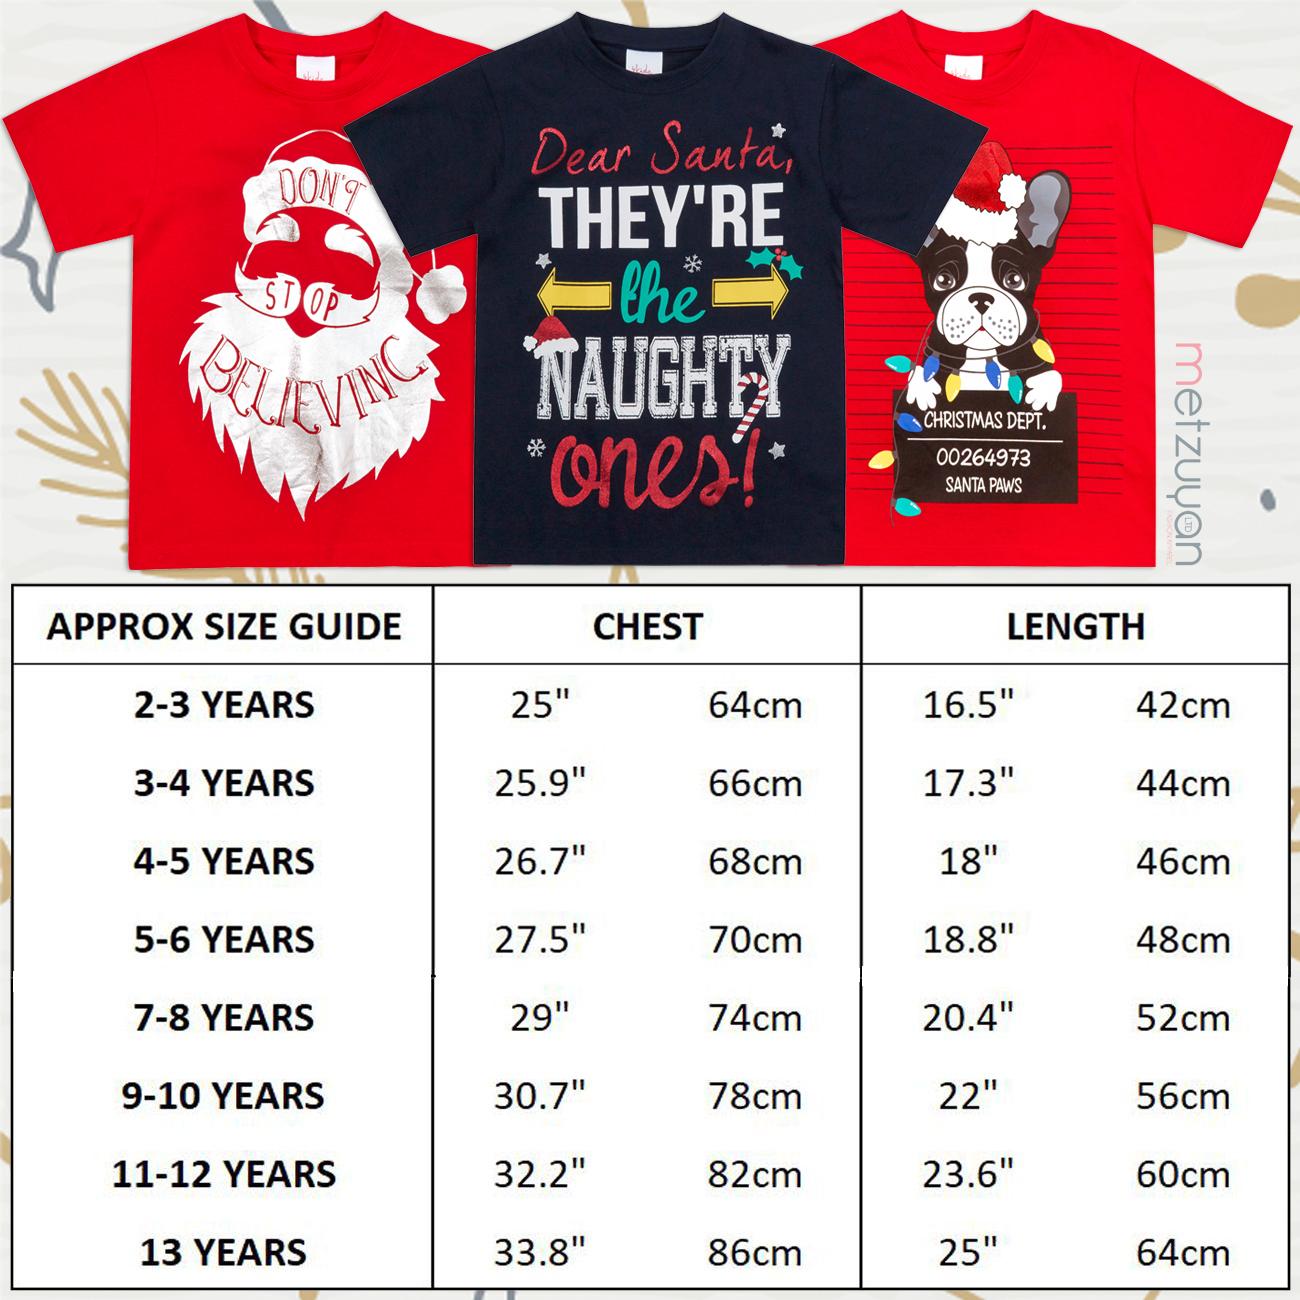 Childrens-Girls-Boys-Xmas-T-Shirts-Printed-Christmas-Design-100-Cotton-2-13-Yrs thumbnail 20